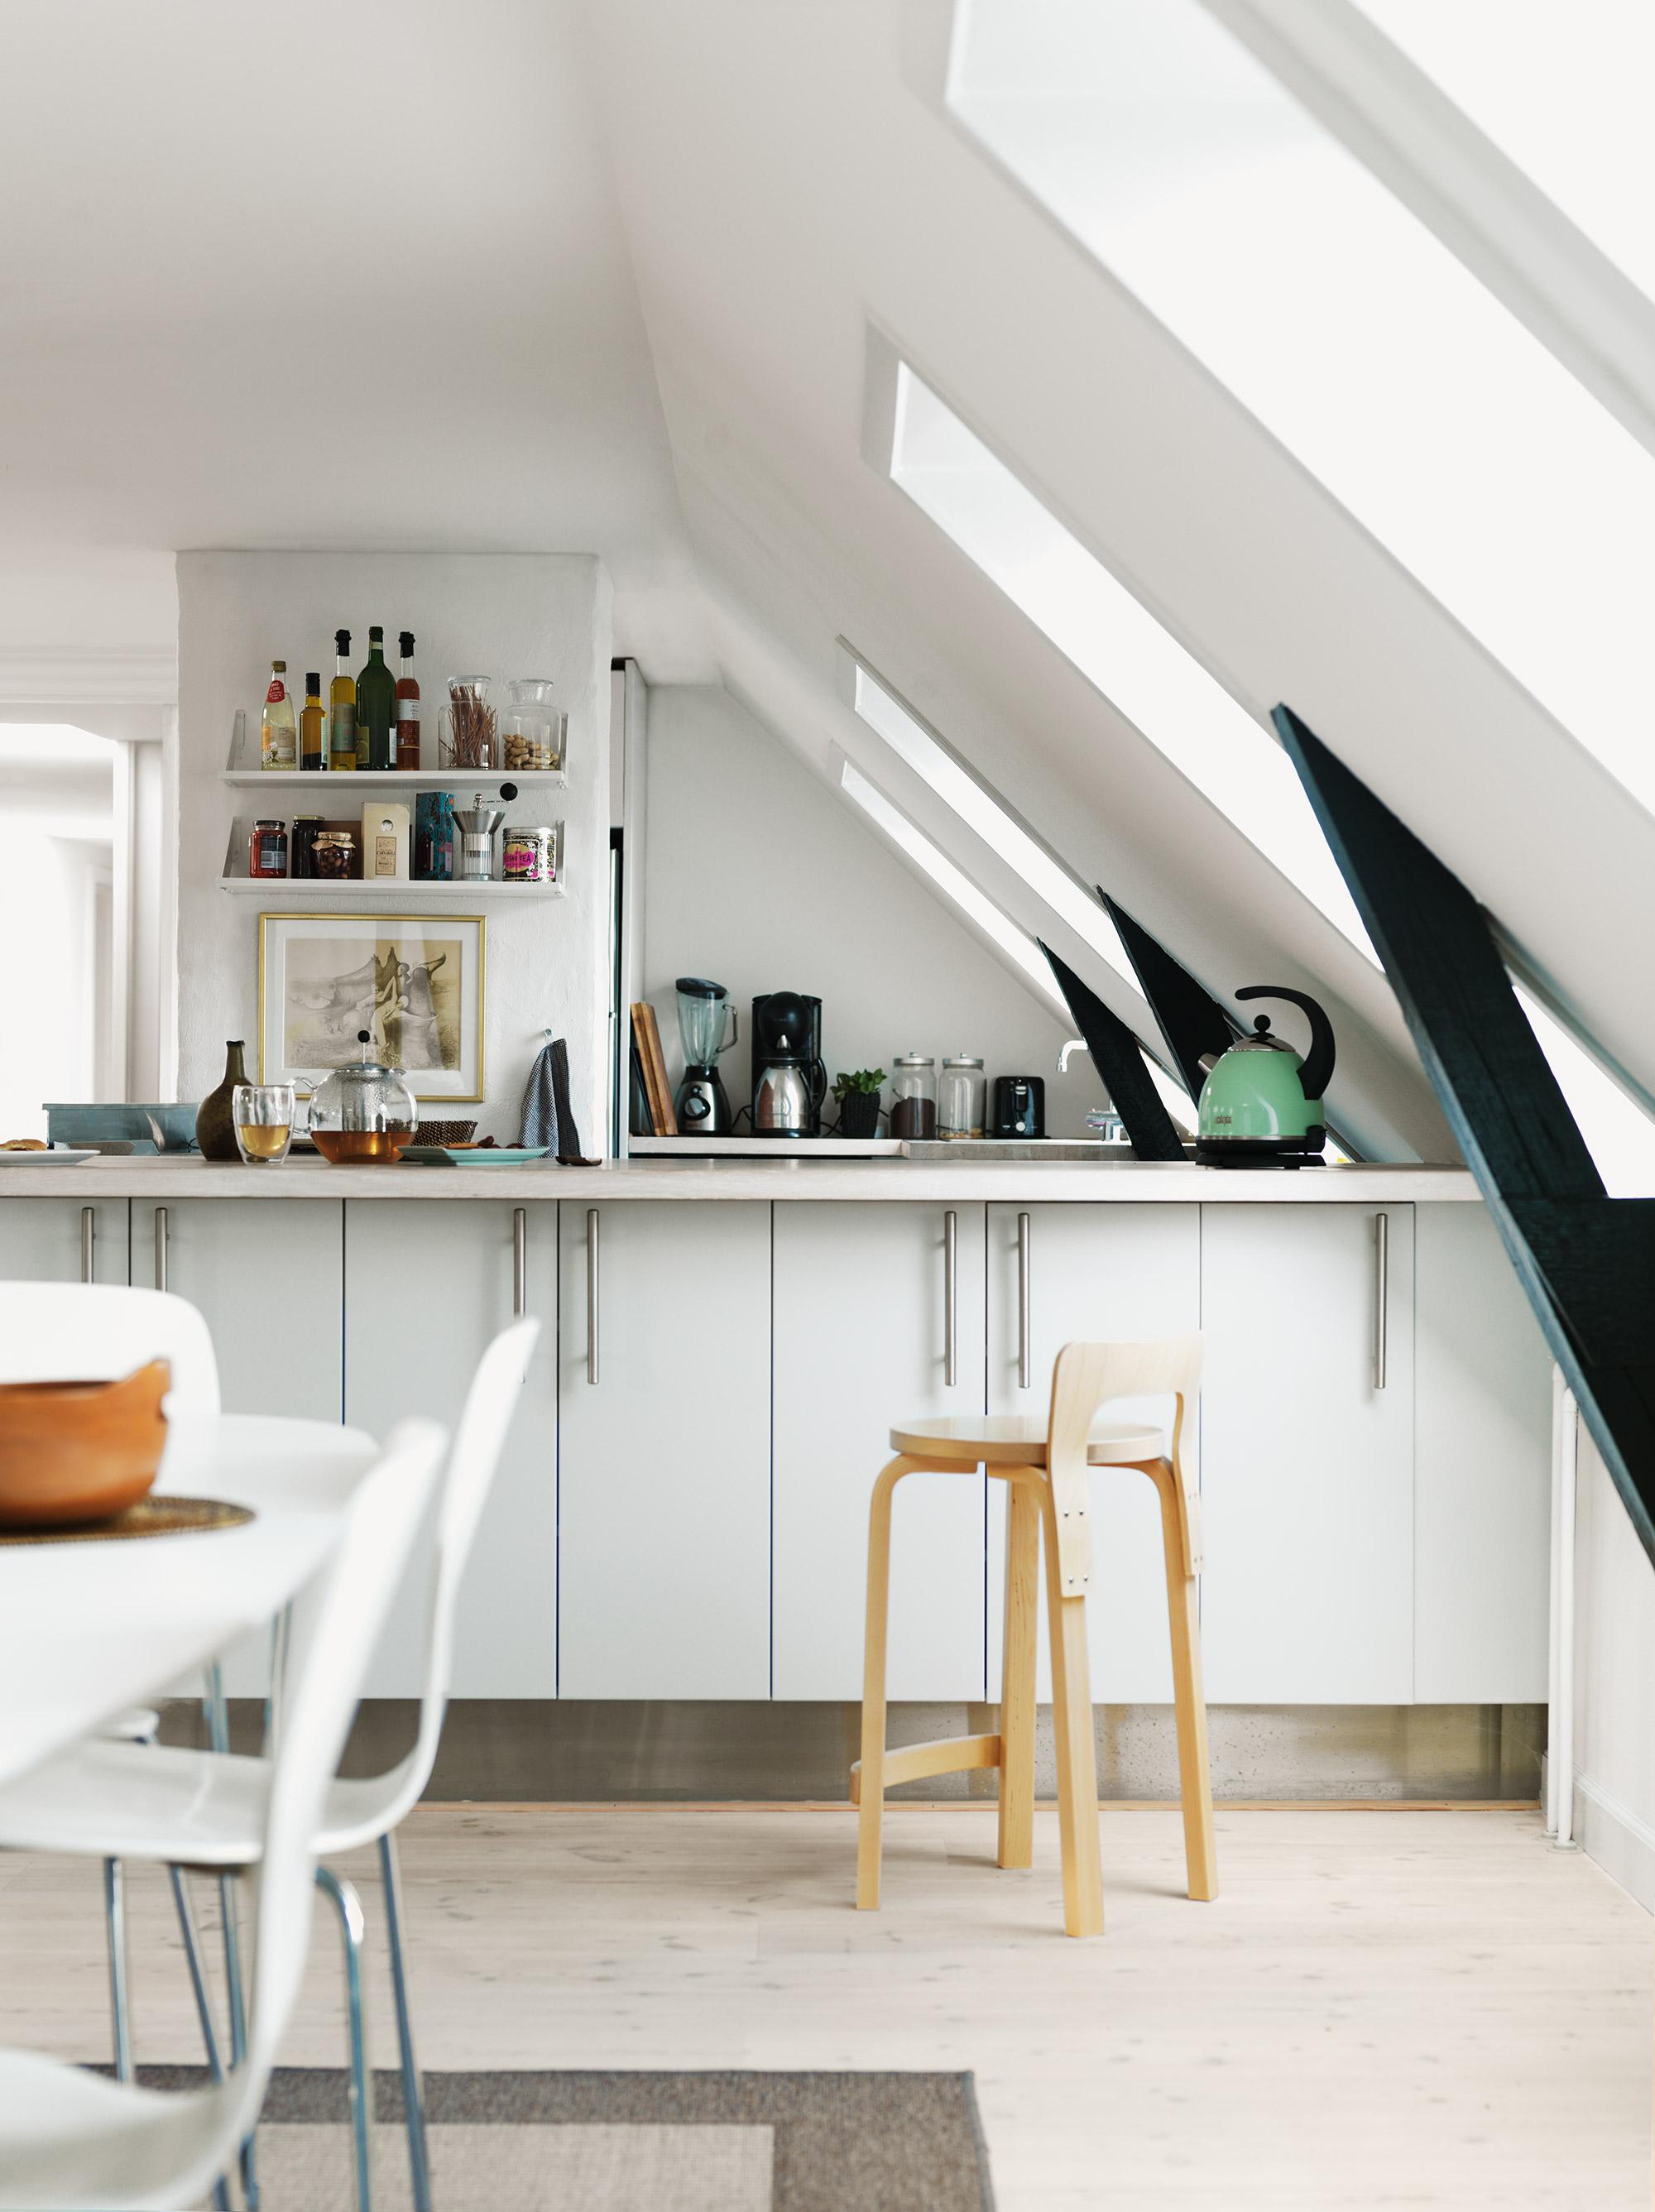 Basic keuken met dakraam